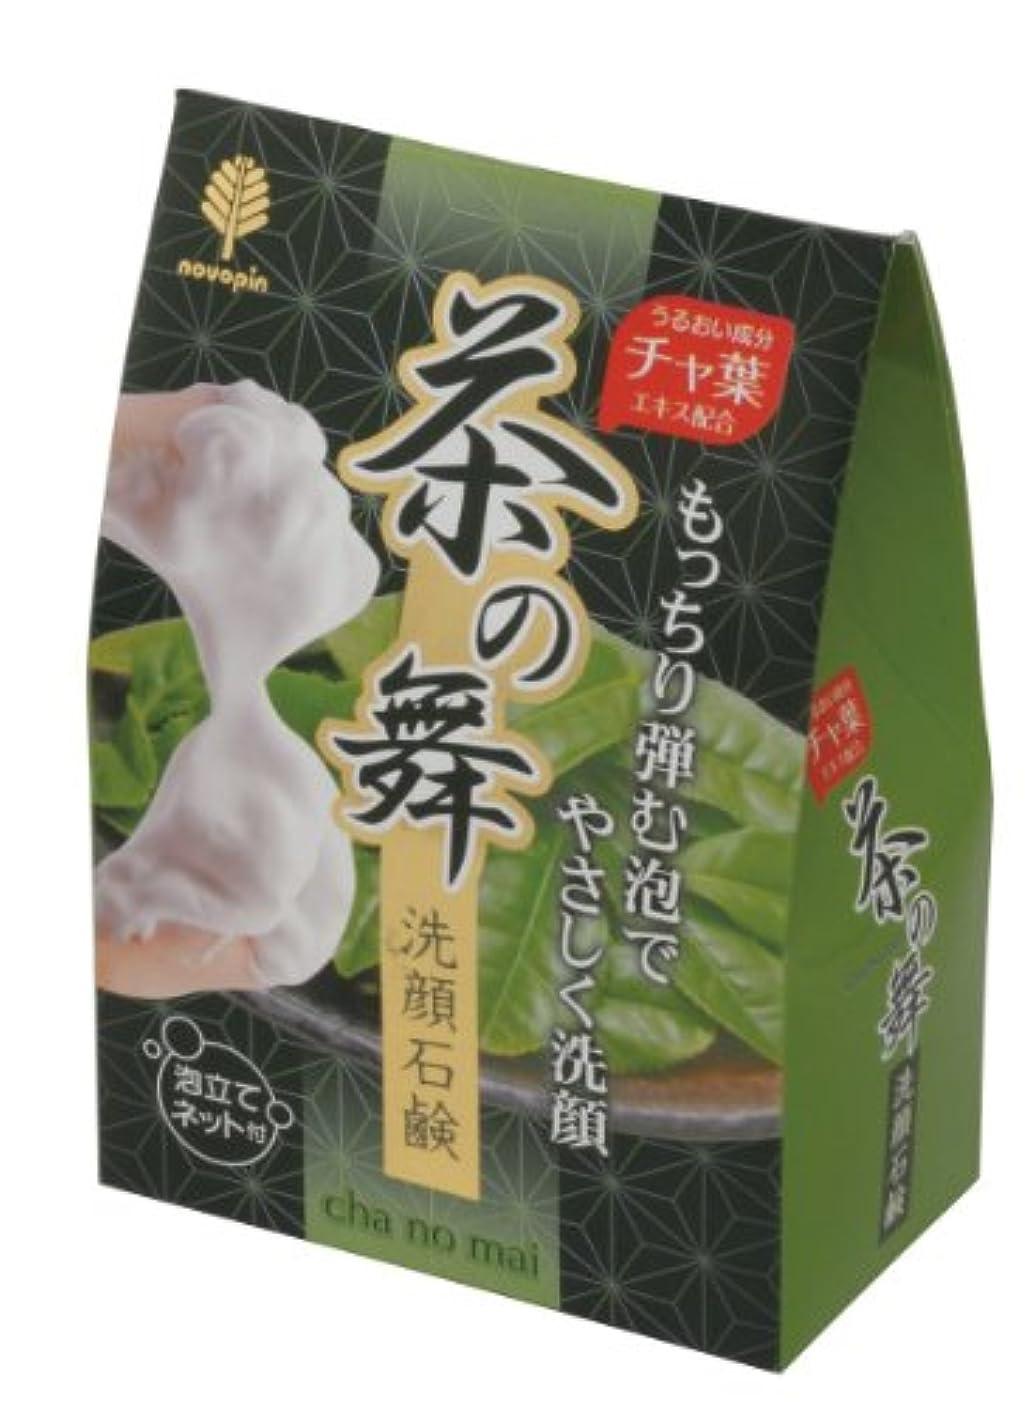 護衛軽減深い紀陽除虫菊 洗顔石鹸 茶の舞 90g